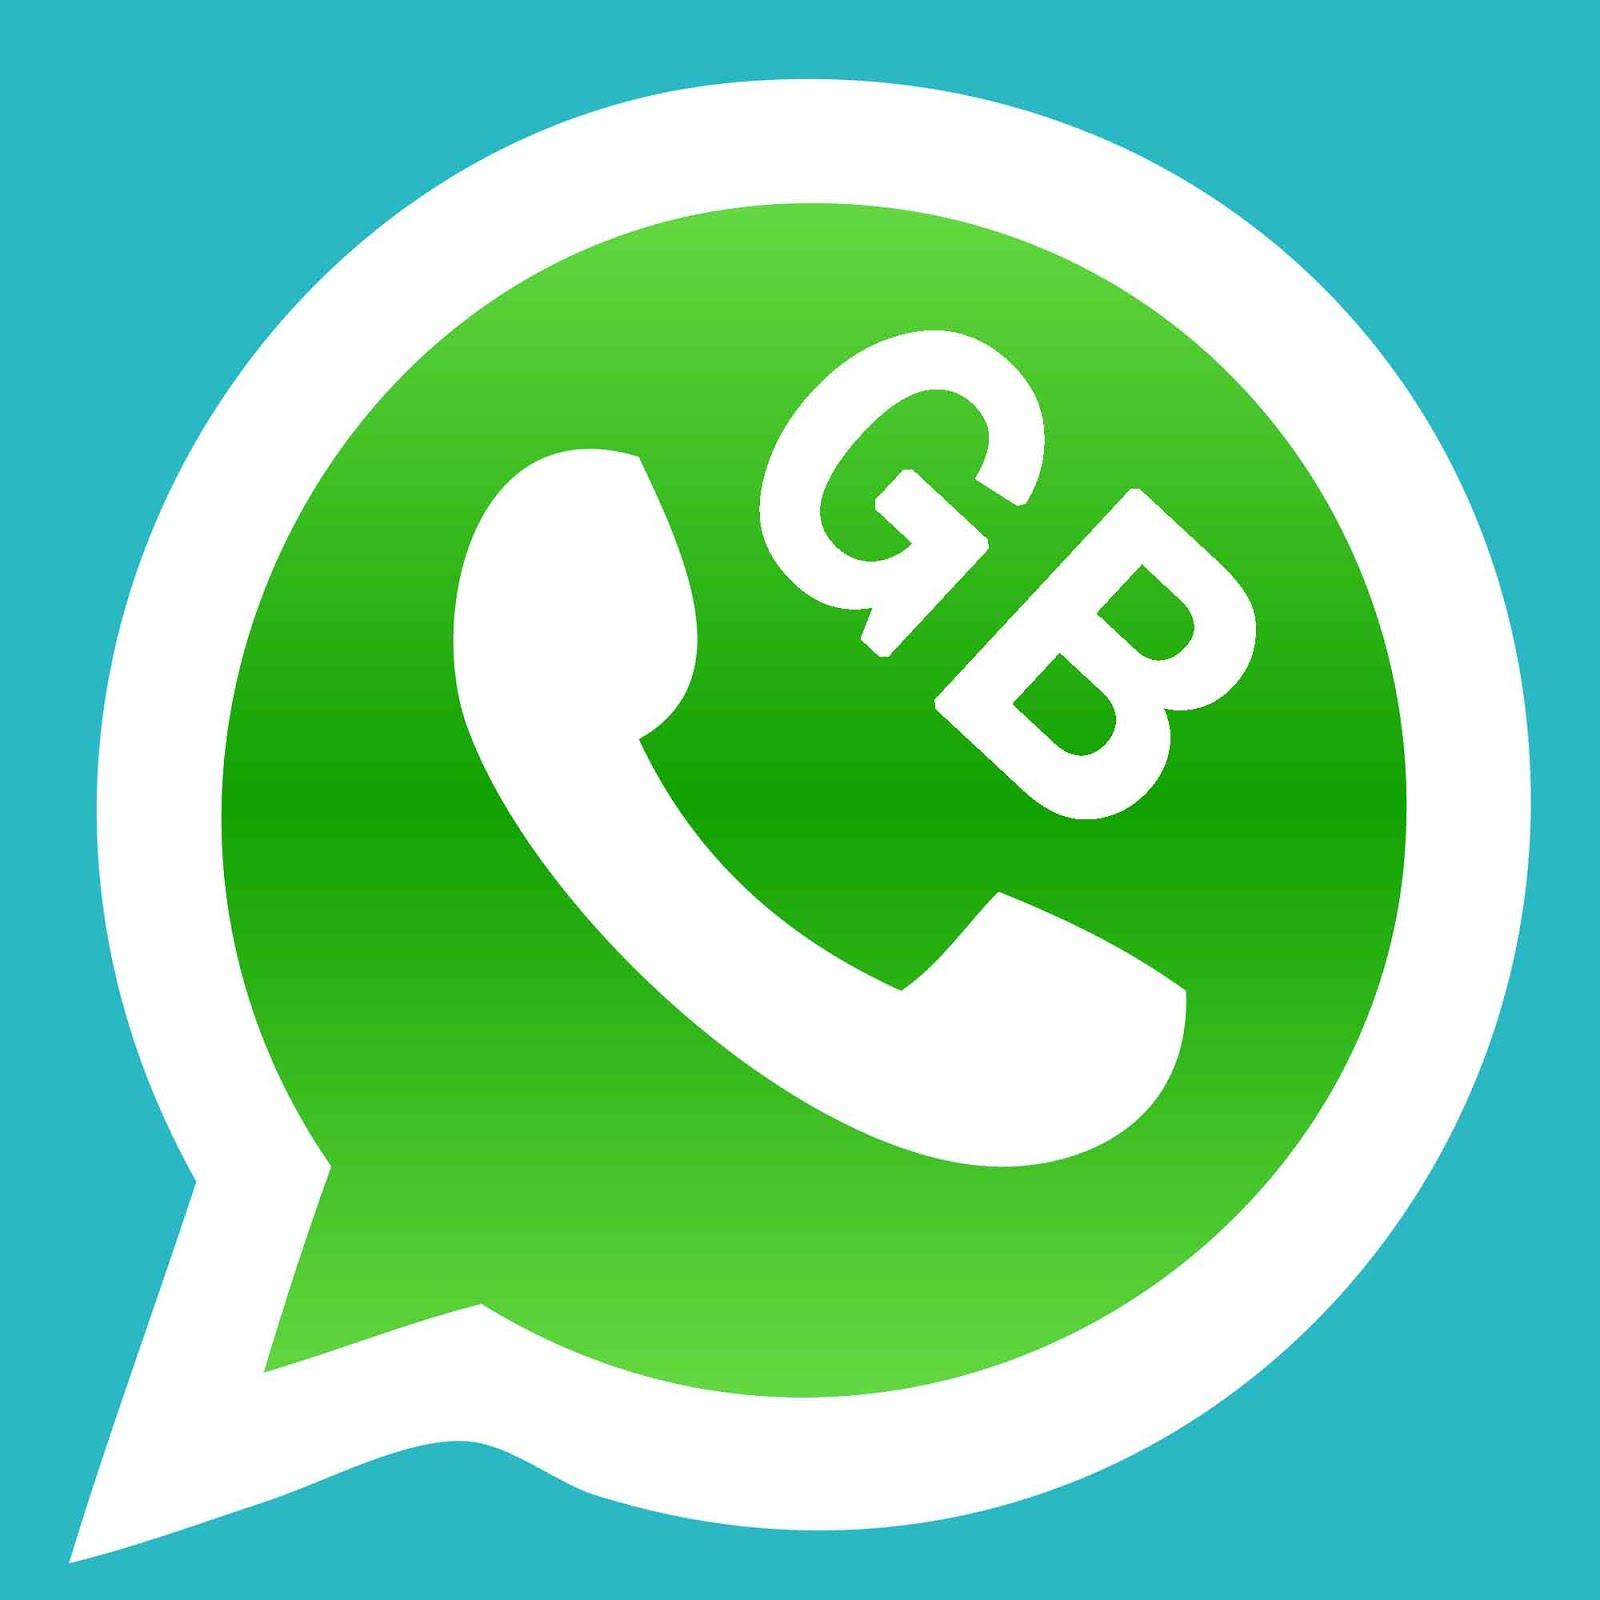 latest version gb whatsapp apk